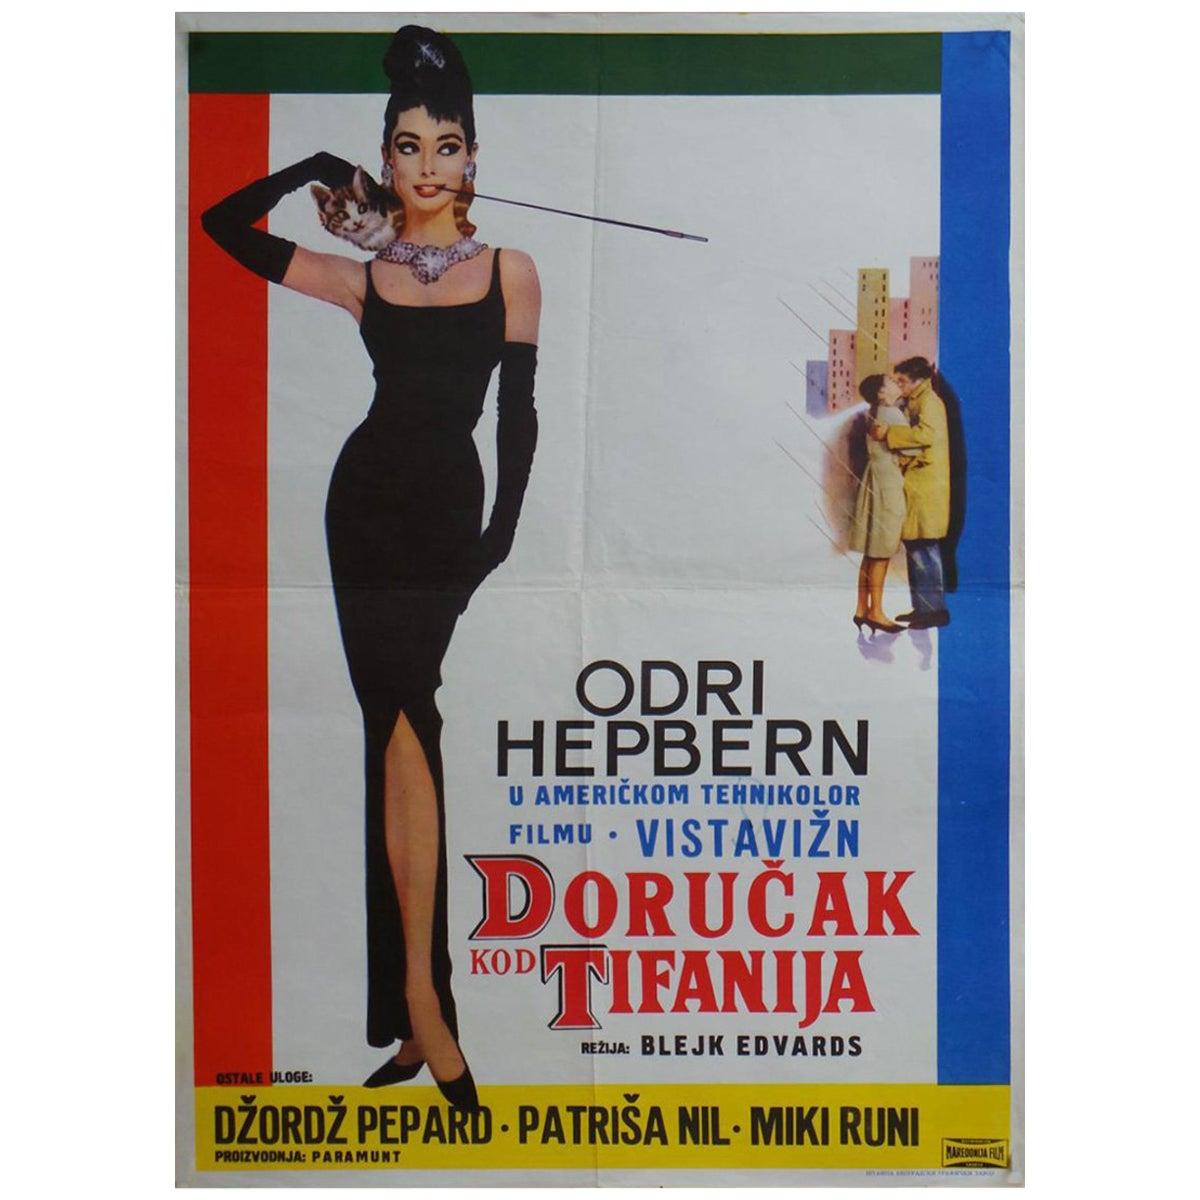 Breakfast at Tiffany's '1961' Poster